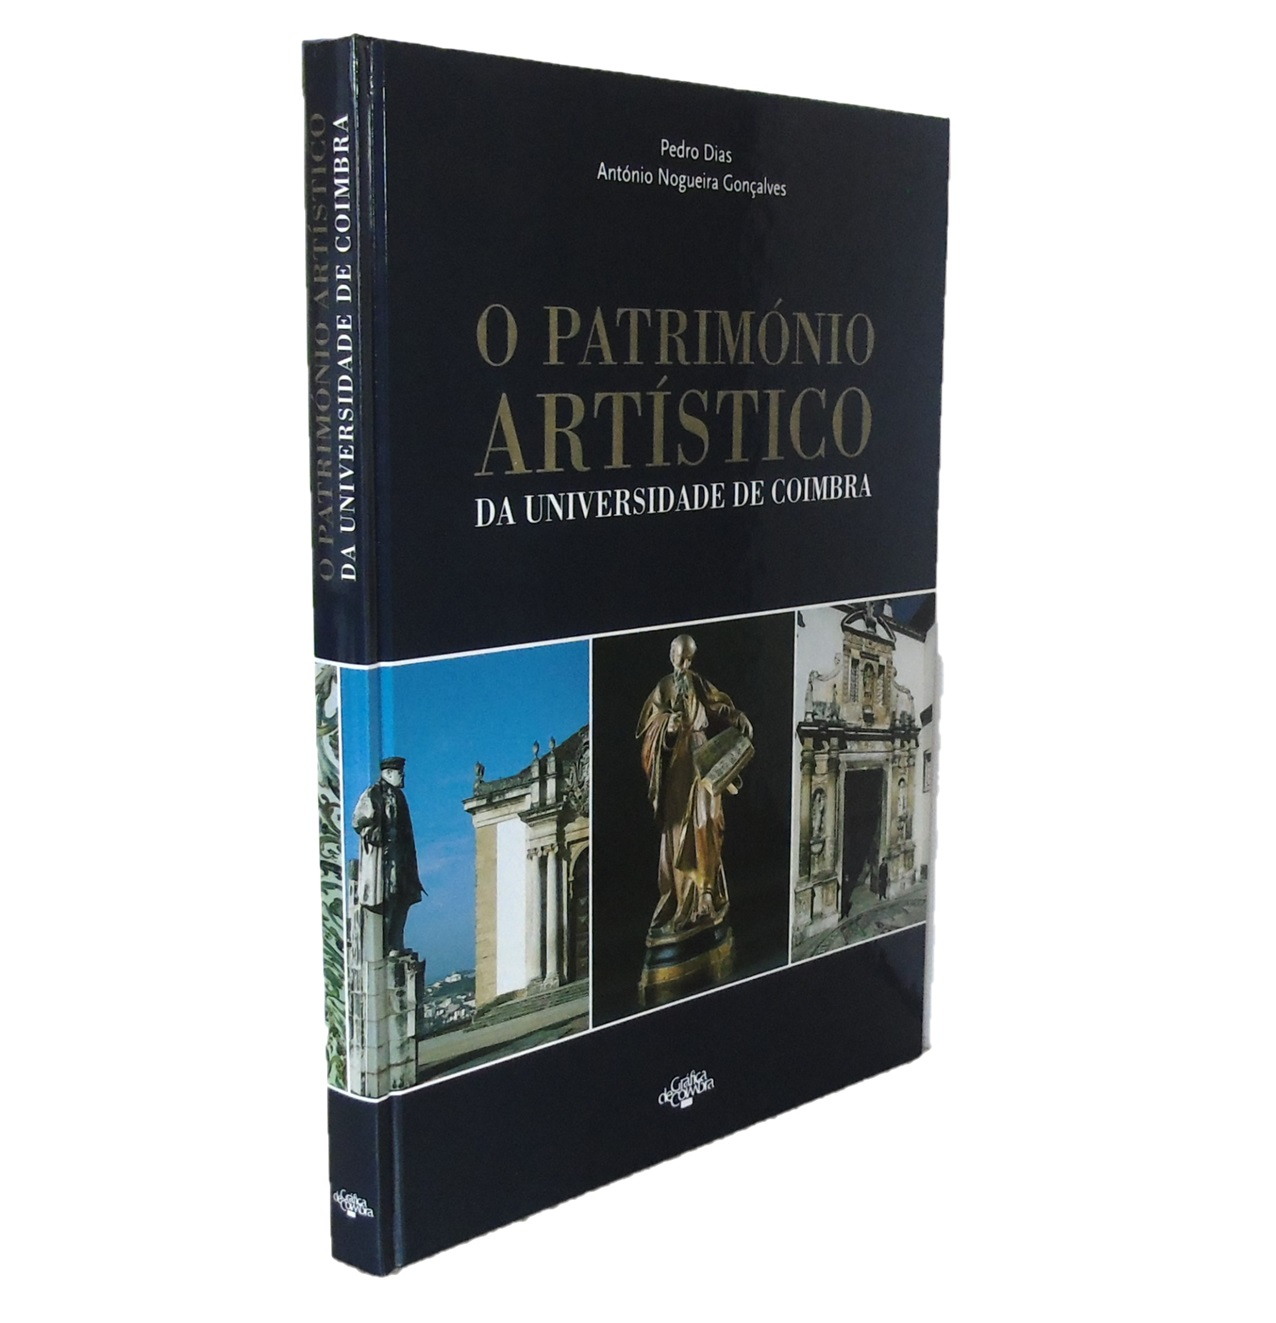 O PATRIMÓNIO ARTÍSTICO DA UNIVERSIDADE DE COIMBRA